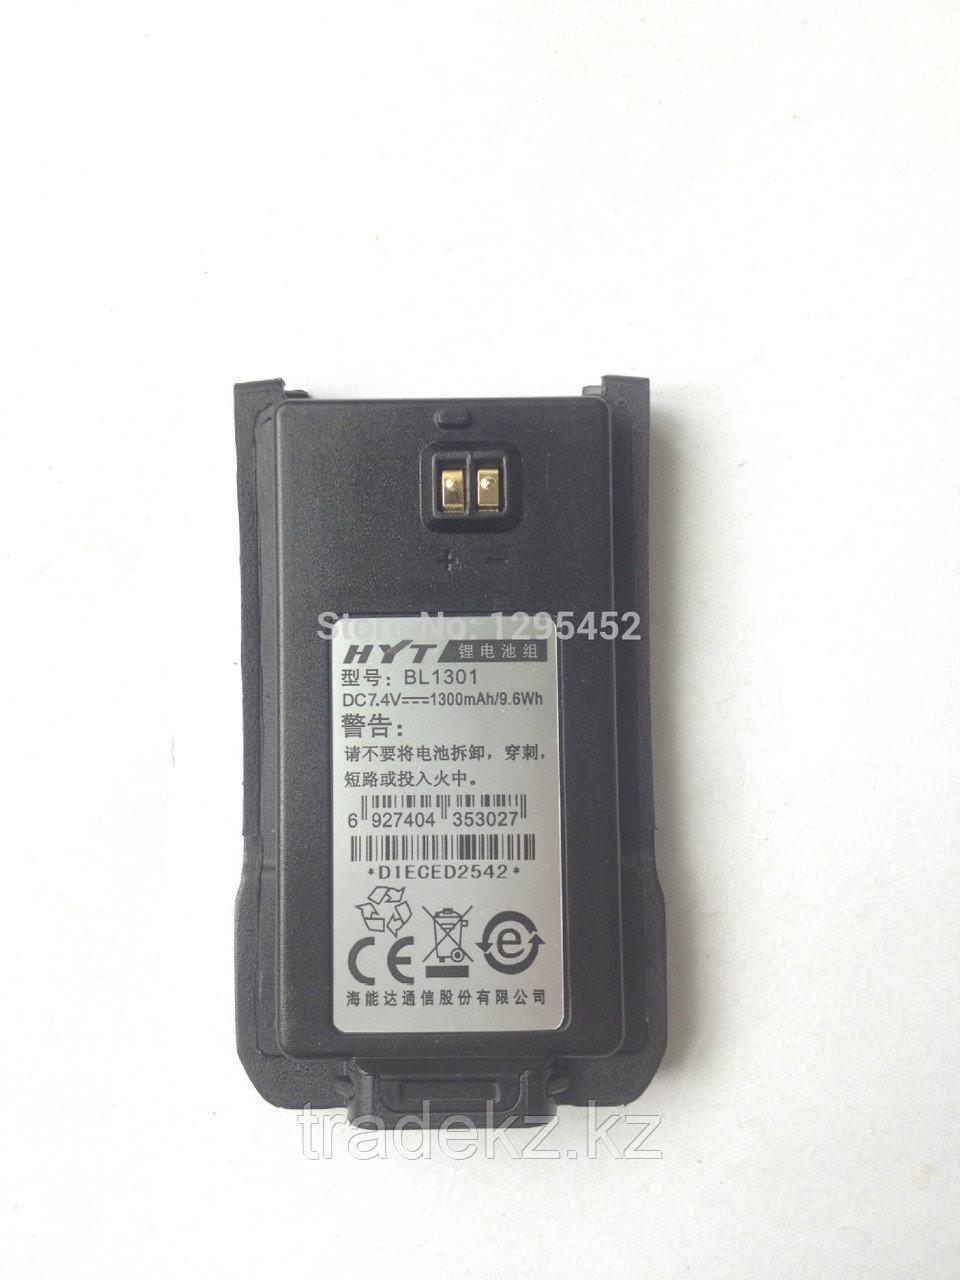 Аккумулятор HYT BL-1301 Li-ion (7,4V-1,3A/H) для р/ст TC-508/518